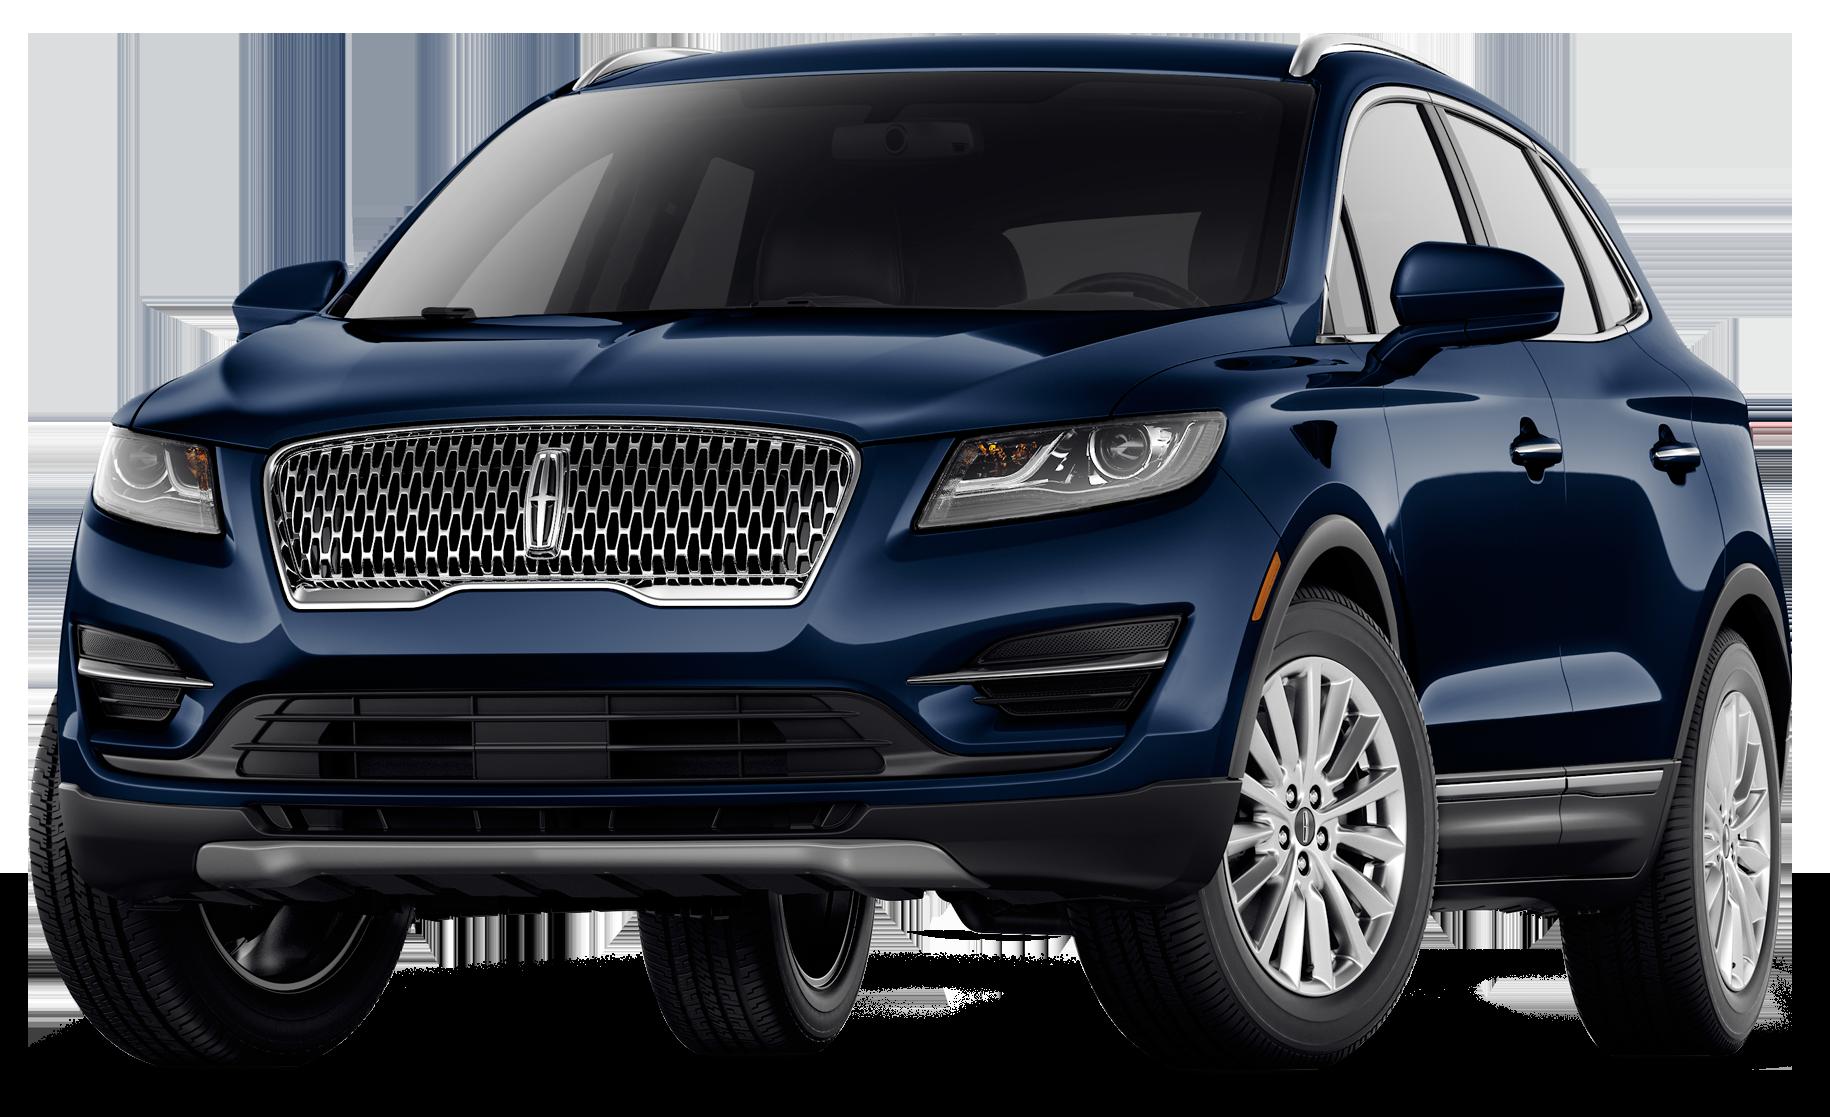 2019 Lincoln MKC Incentives Specials & fers in Victoria TX